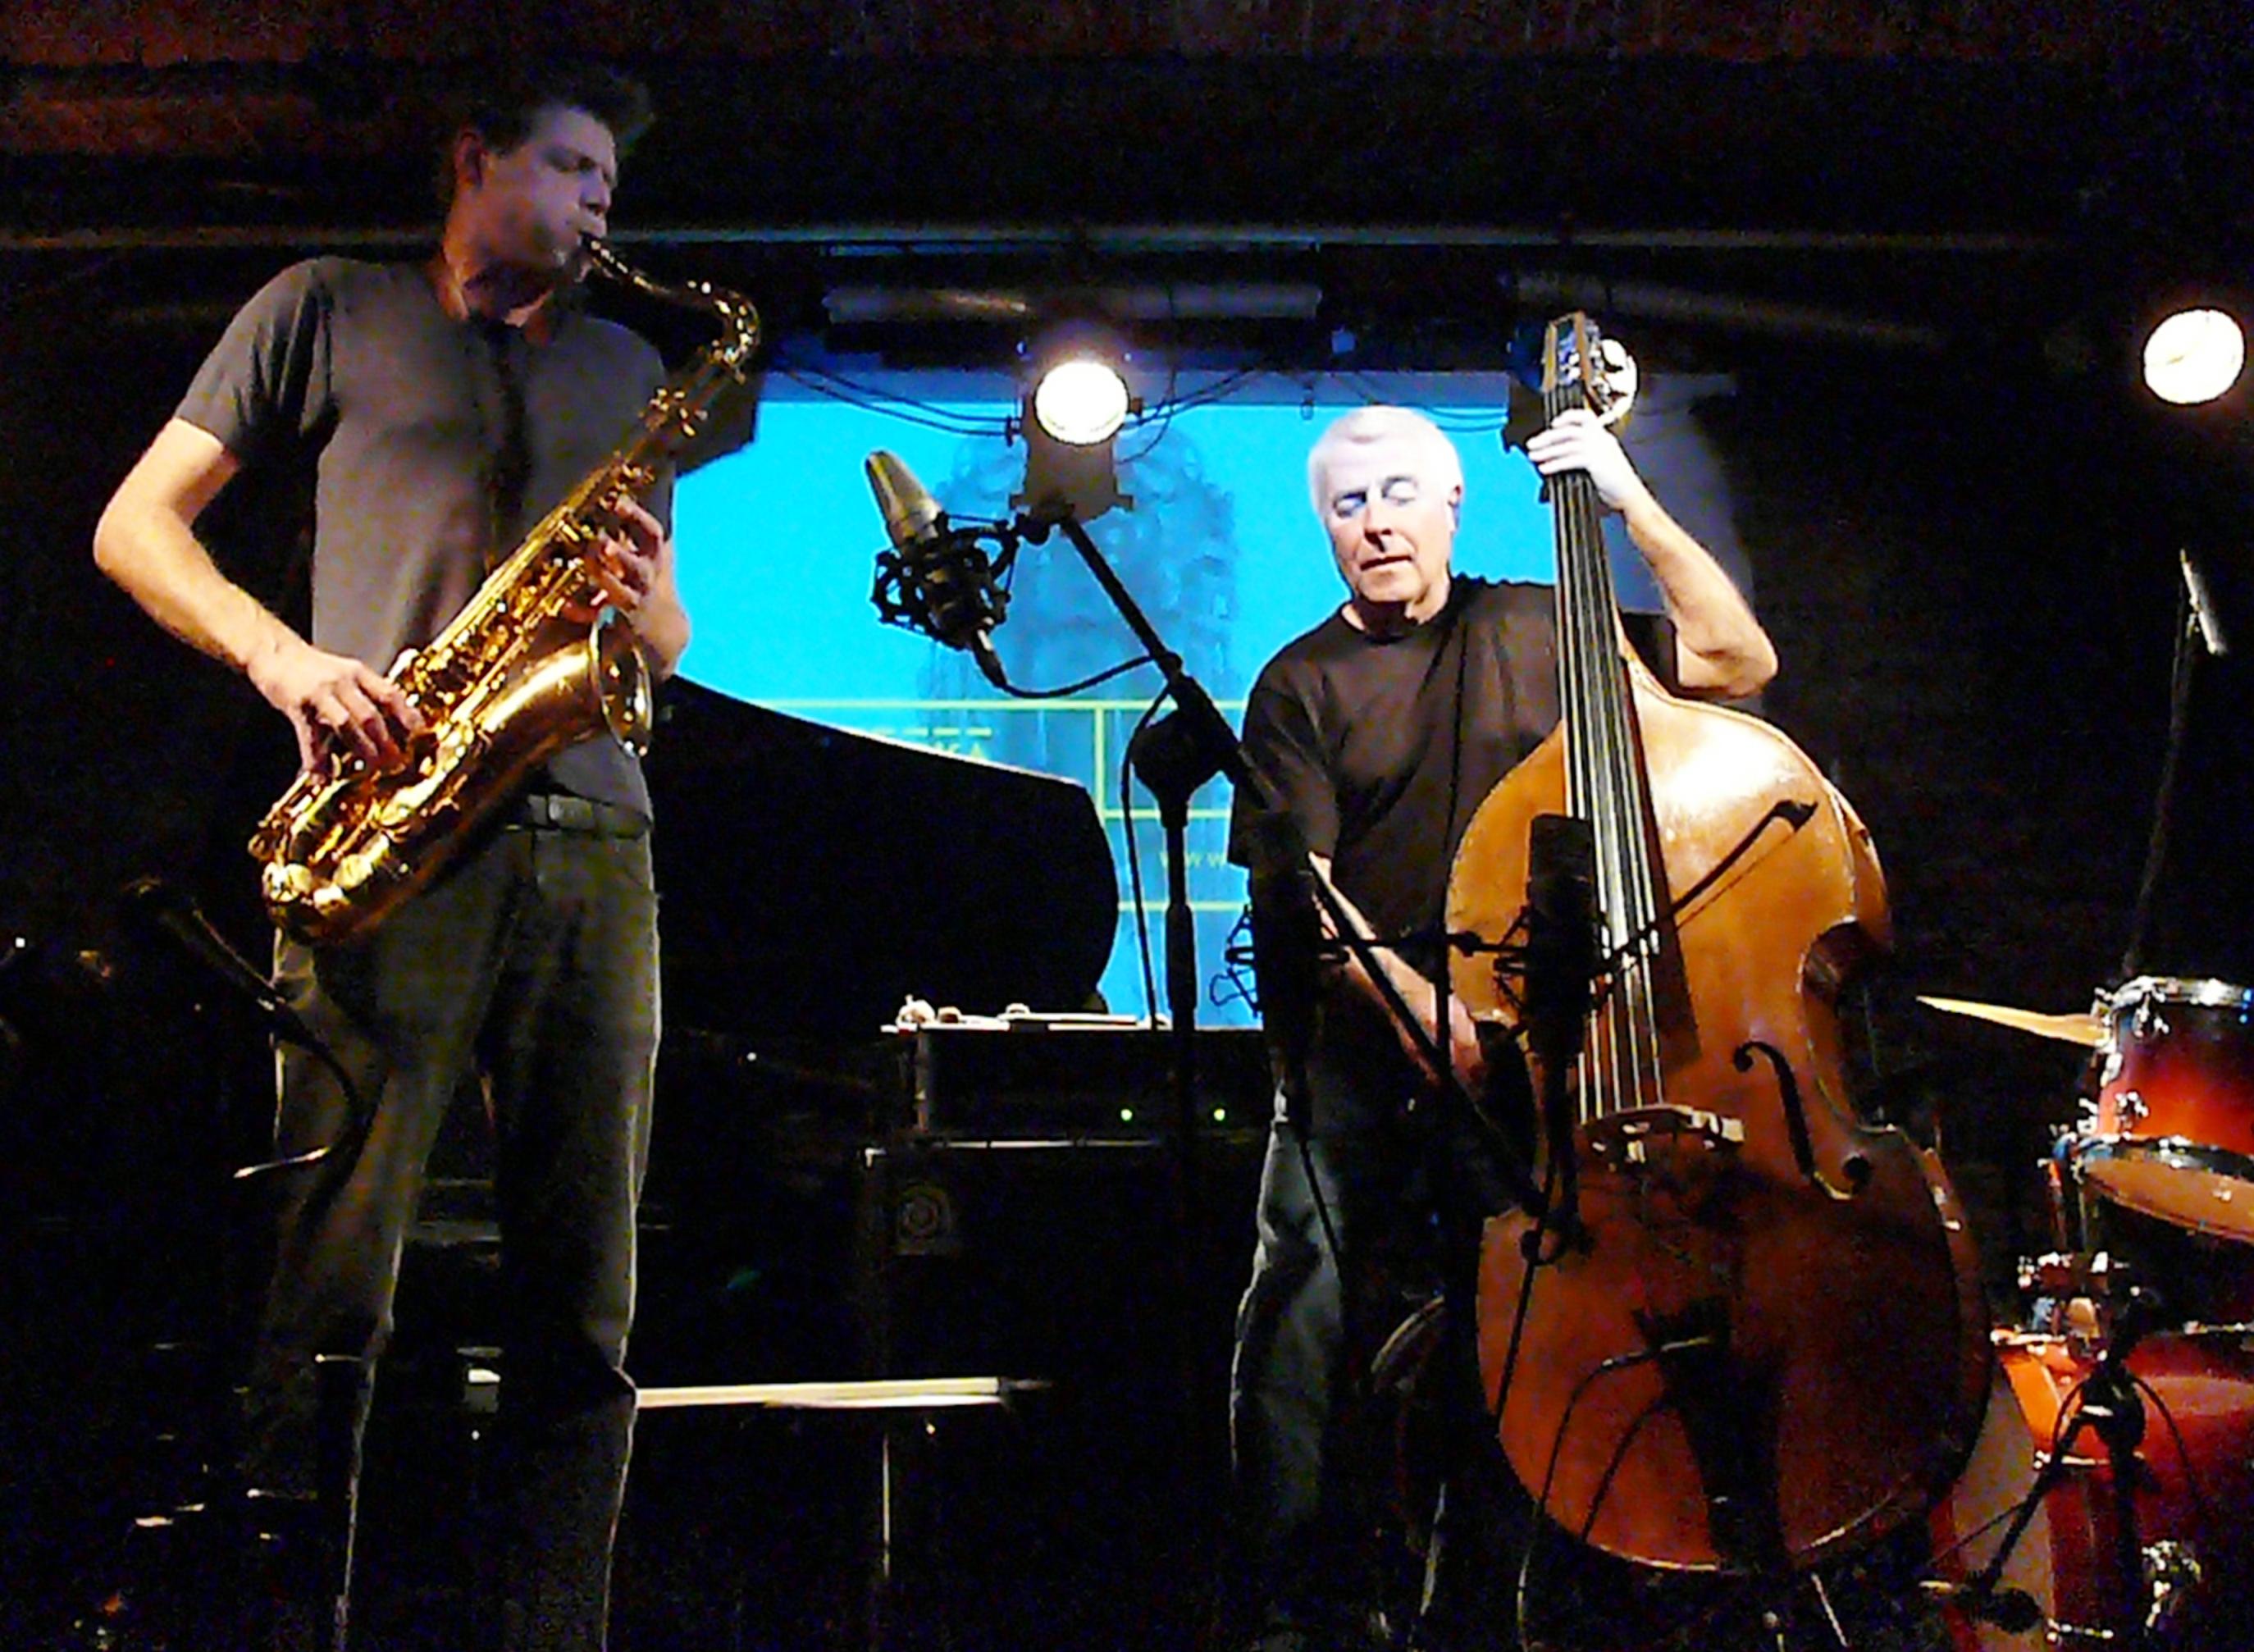 Torben Snekkestad and Barry Guy at Alchemia, Krakow in November 2014